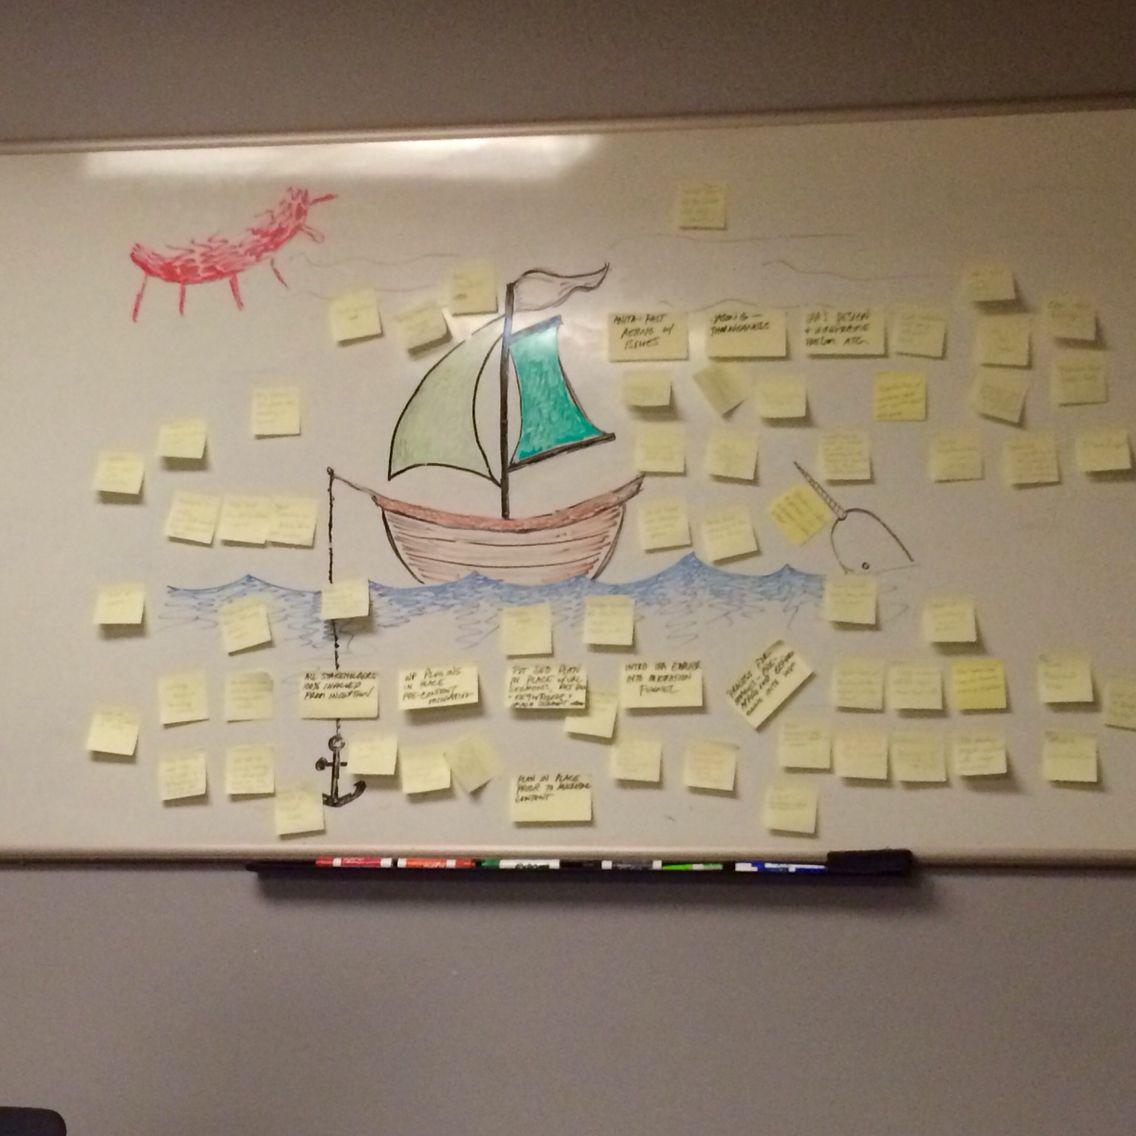 Agile Spiele agile retrospective game - winds and anchors | flipcharts